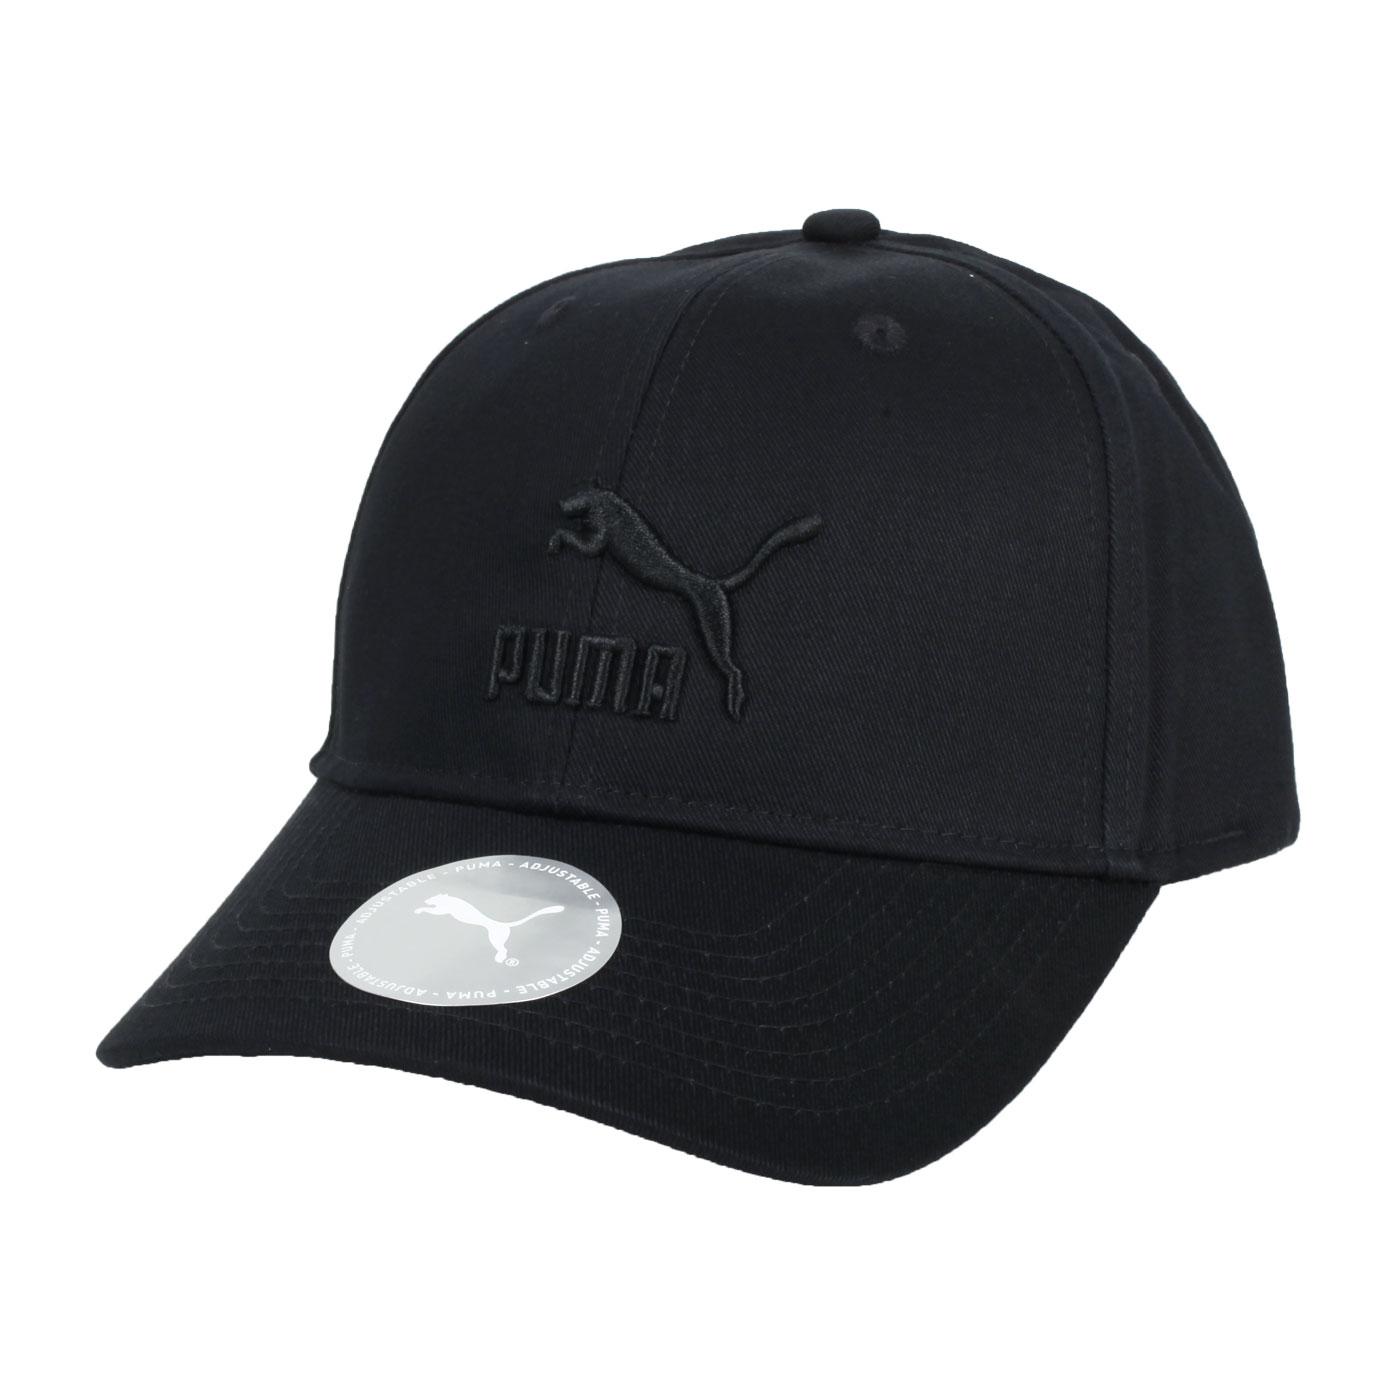 PUMA 流行系列棒球帽 02255415 - 黑